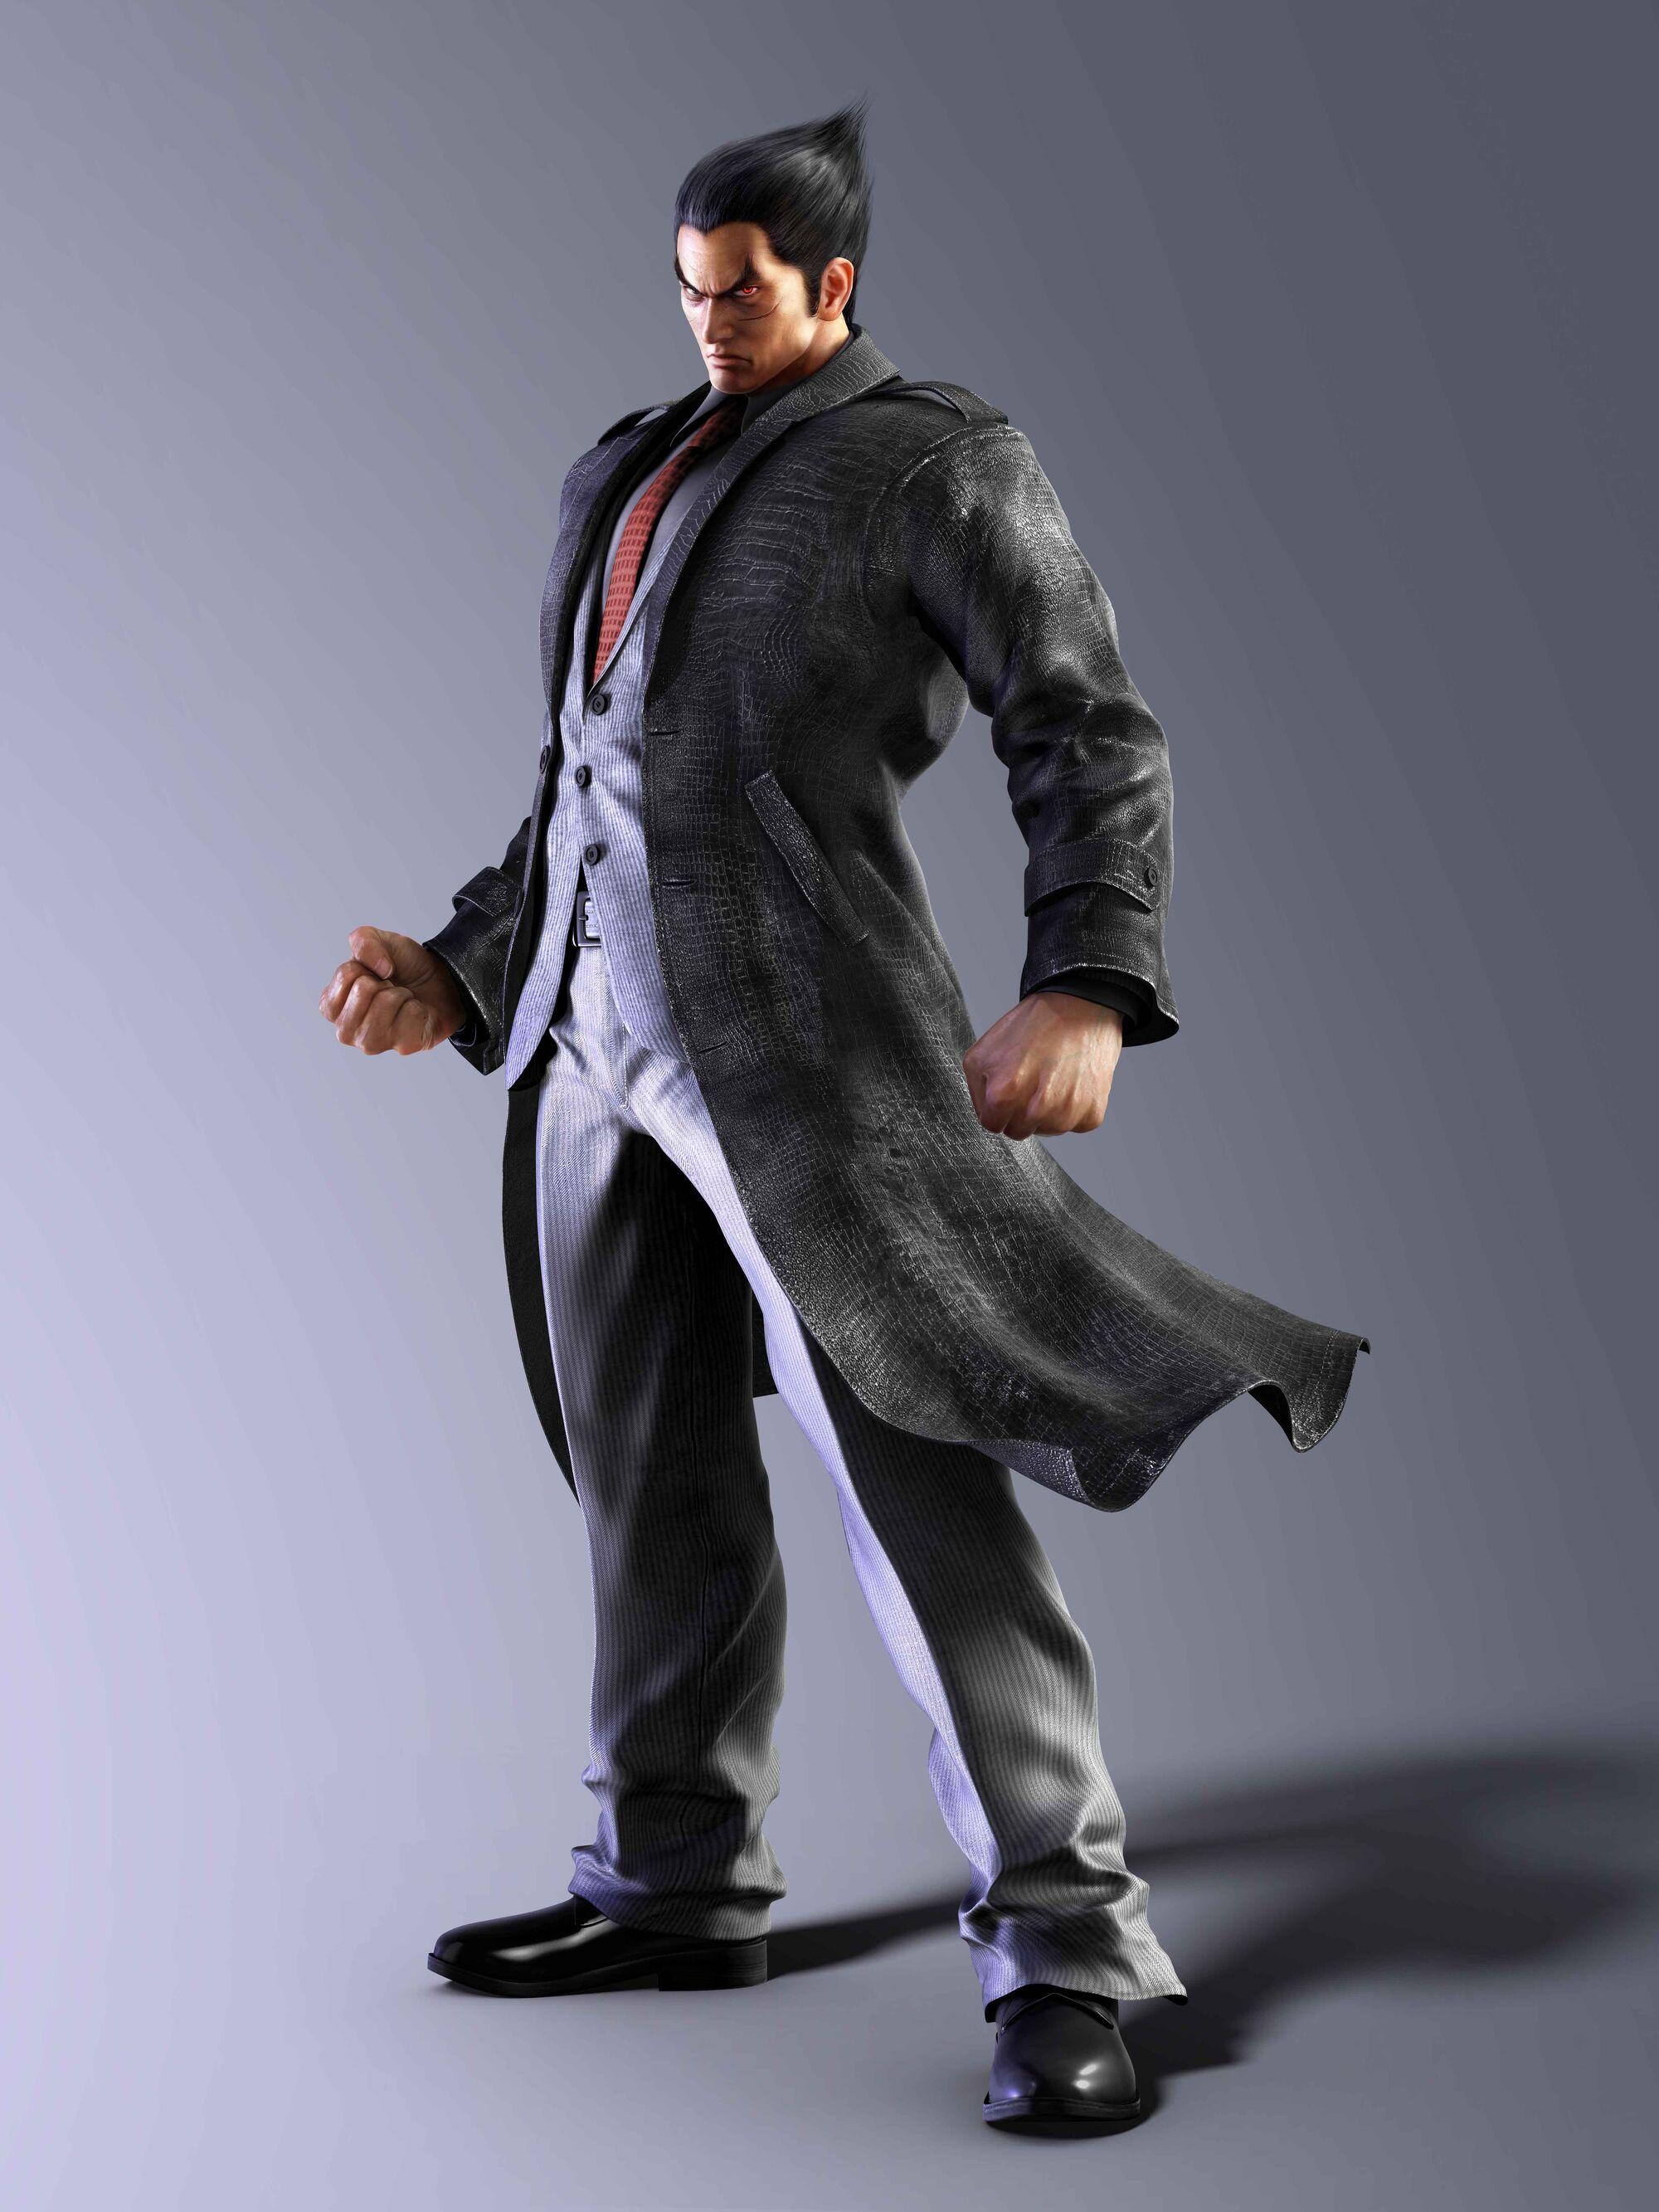 Kazuya Mishima | Tekken Wiki | Fandom